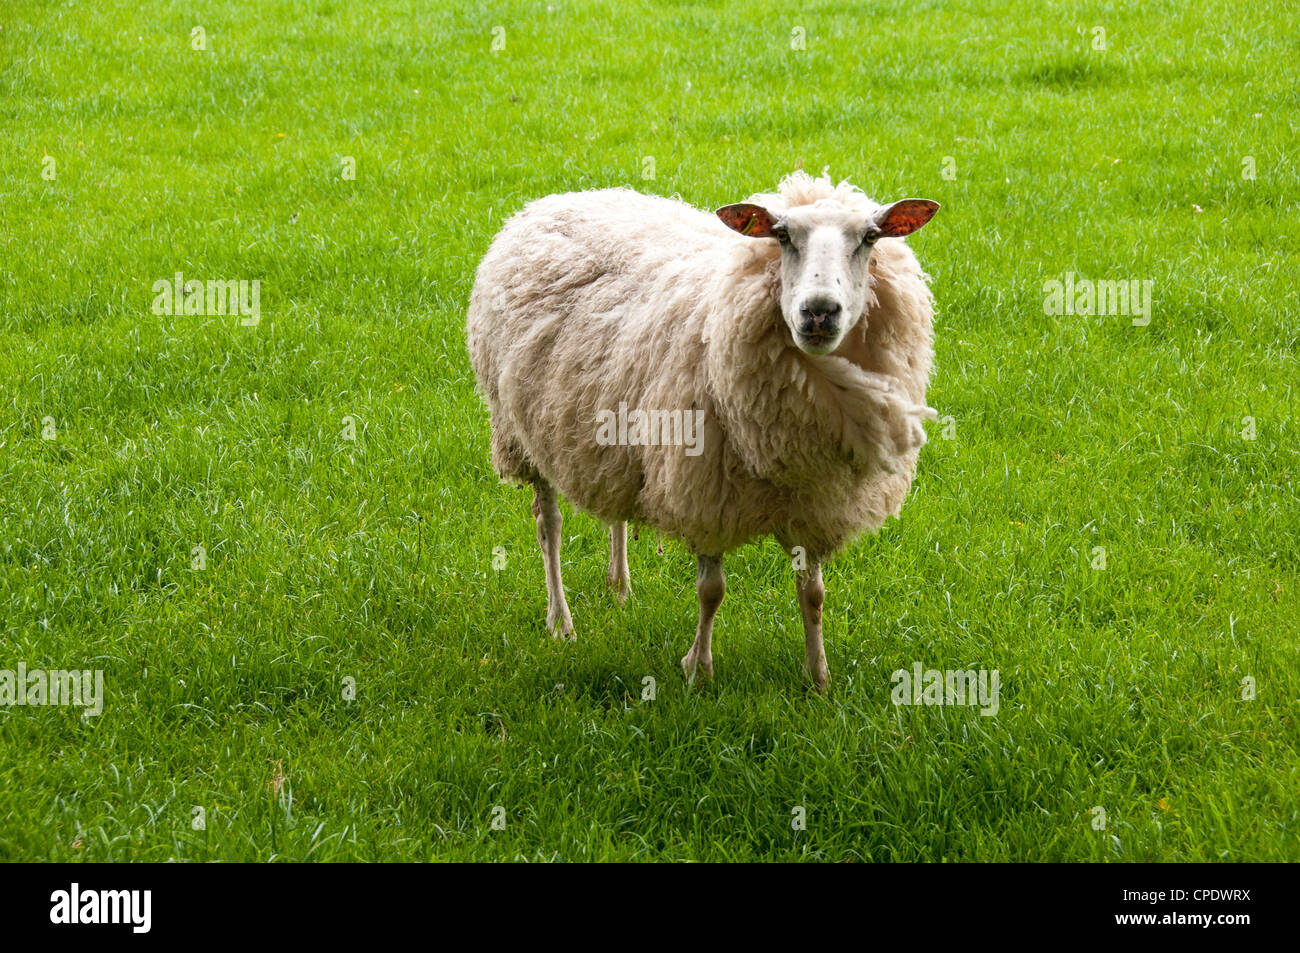 New Zealand North Island near Wellington,  sheep milking at artisan cheese maker Kingsmeade in Wairarapa - Stock Image